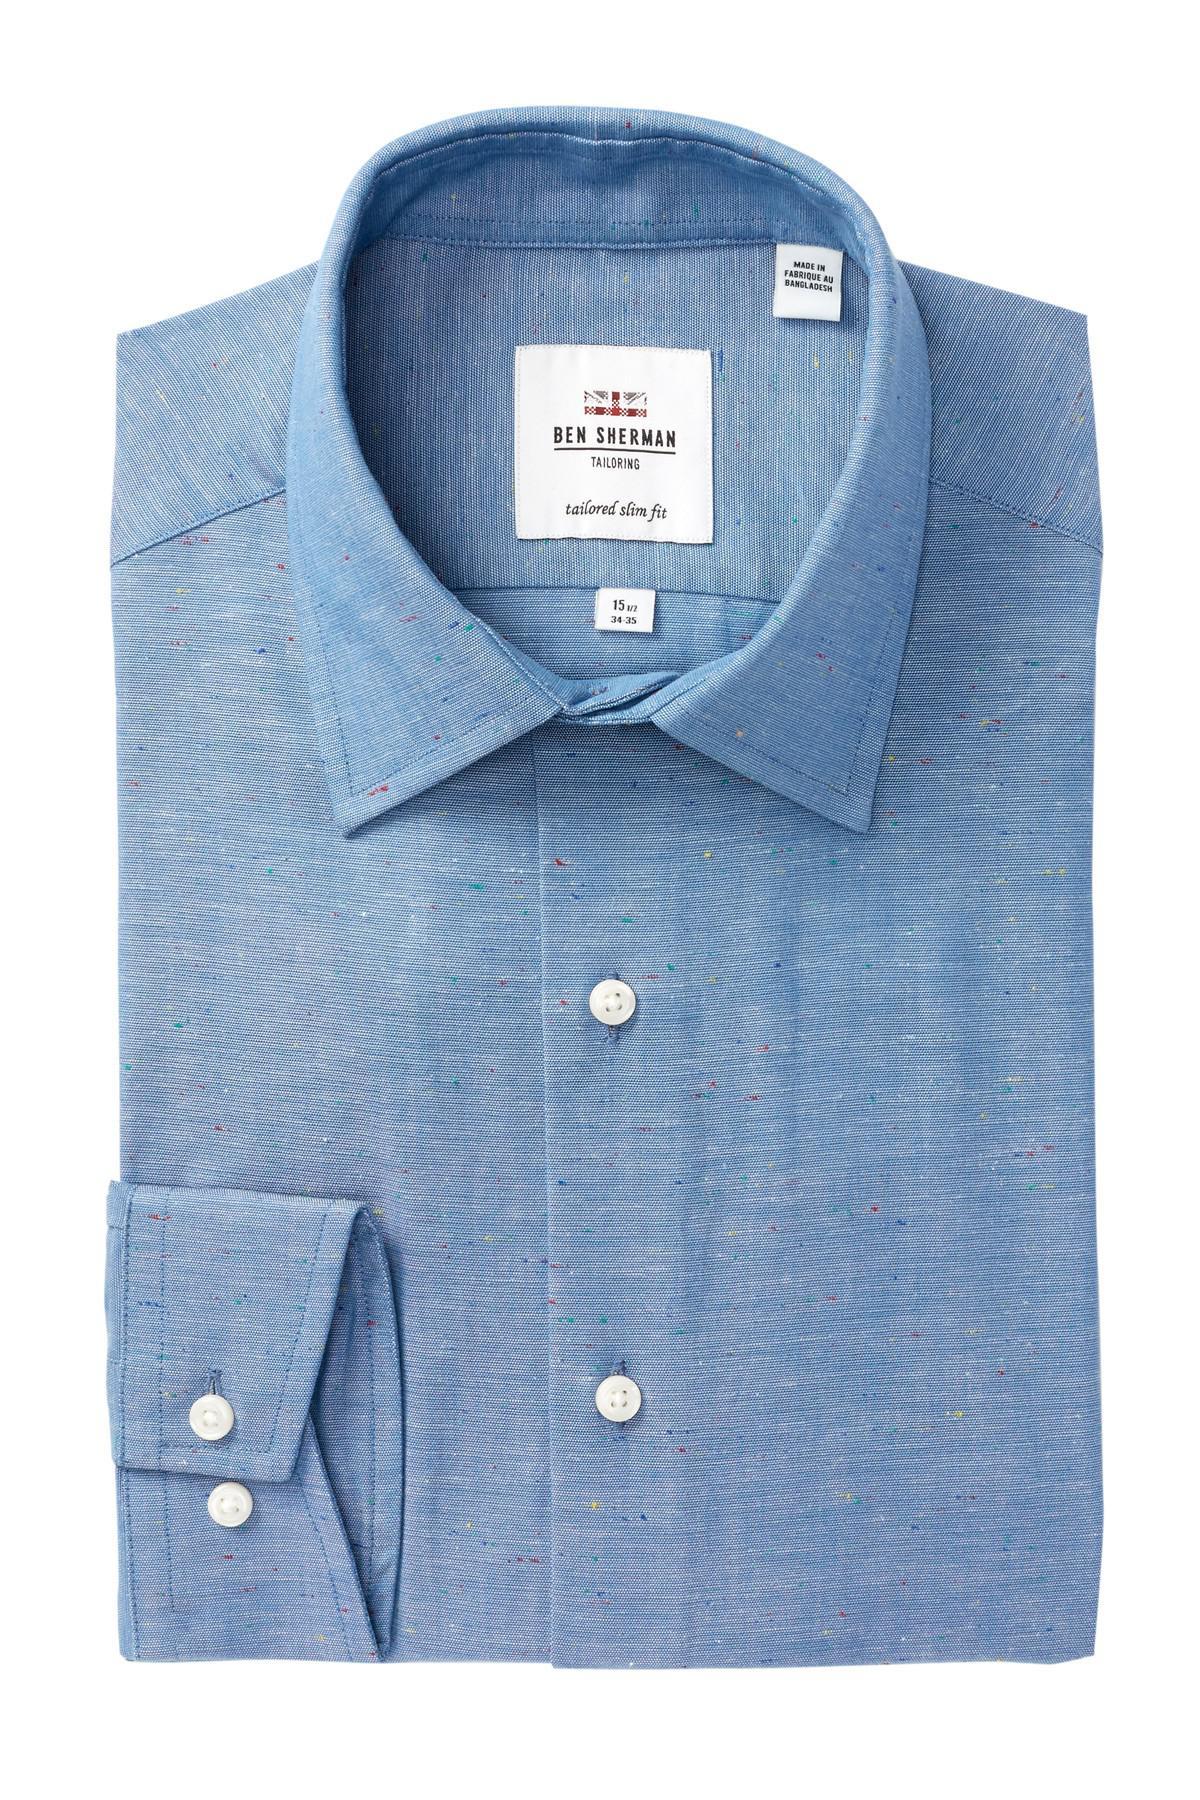 Lyst ben sherman slub chambray florentine tailored slim for Tailoring a dress shirt